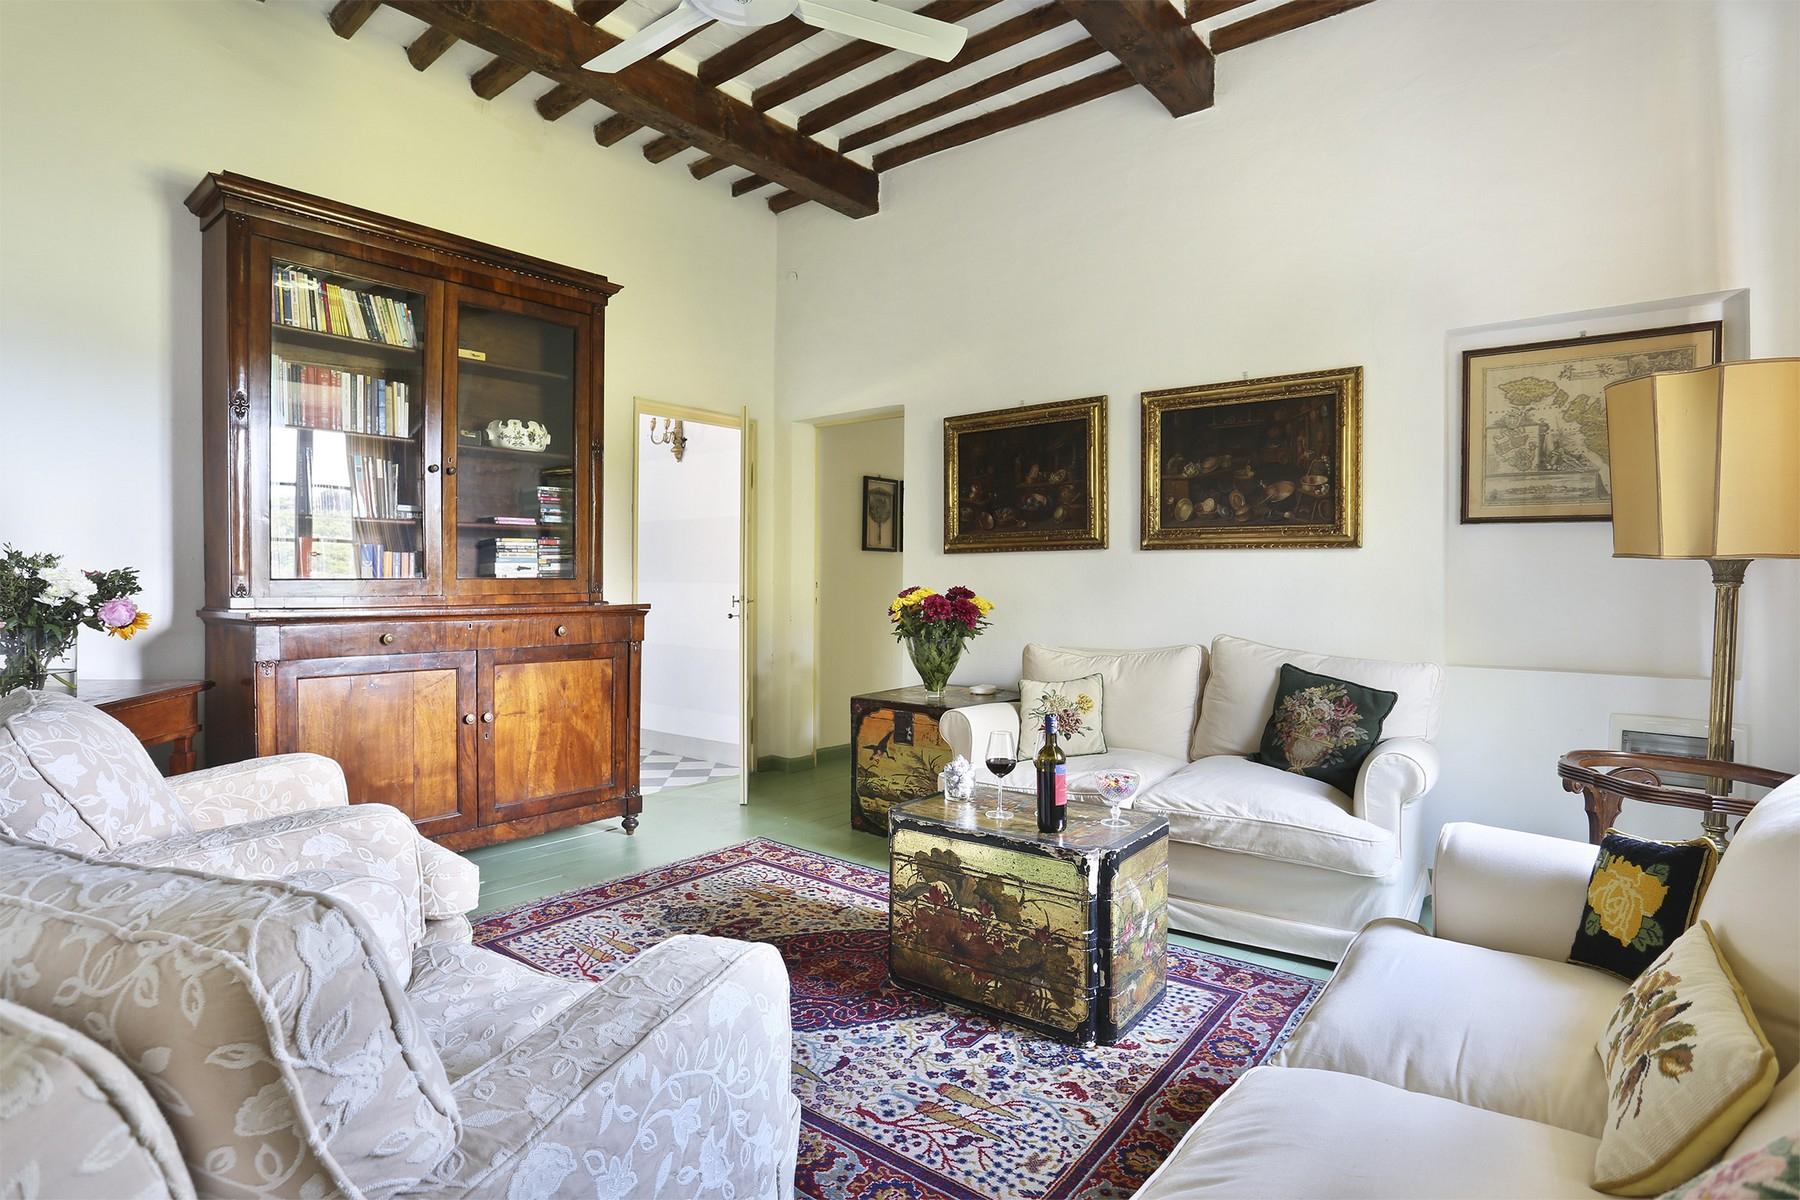 Villa in Vendita a Lucca: 5 locali, 735 mq - Foto 19